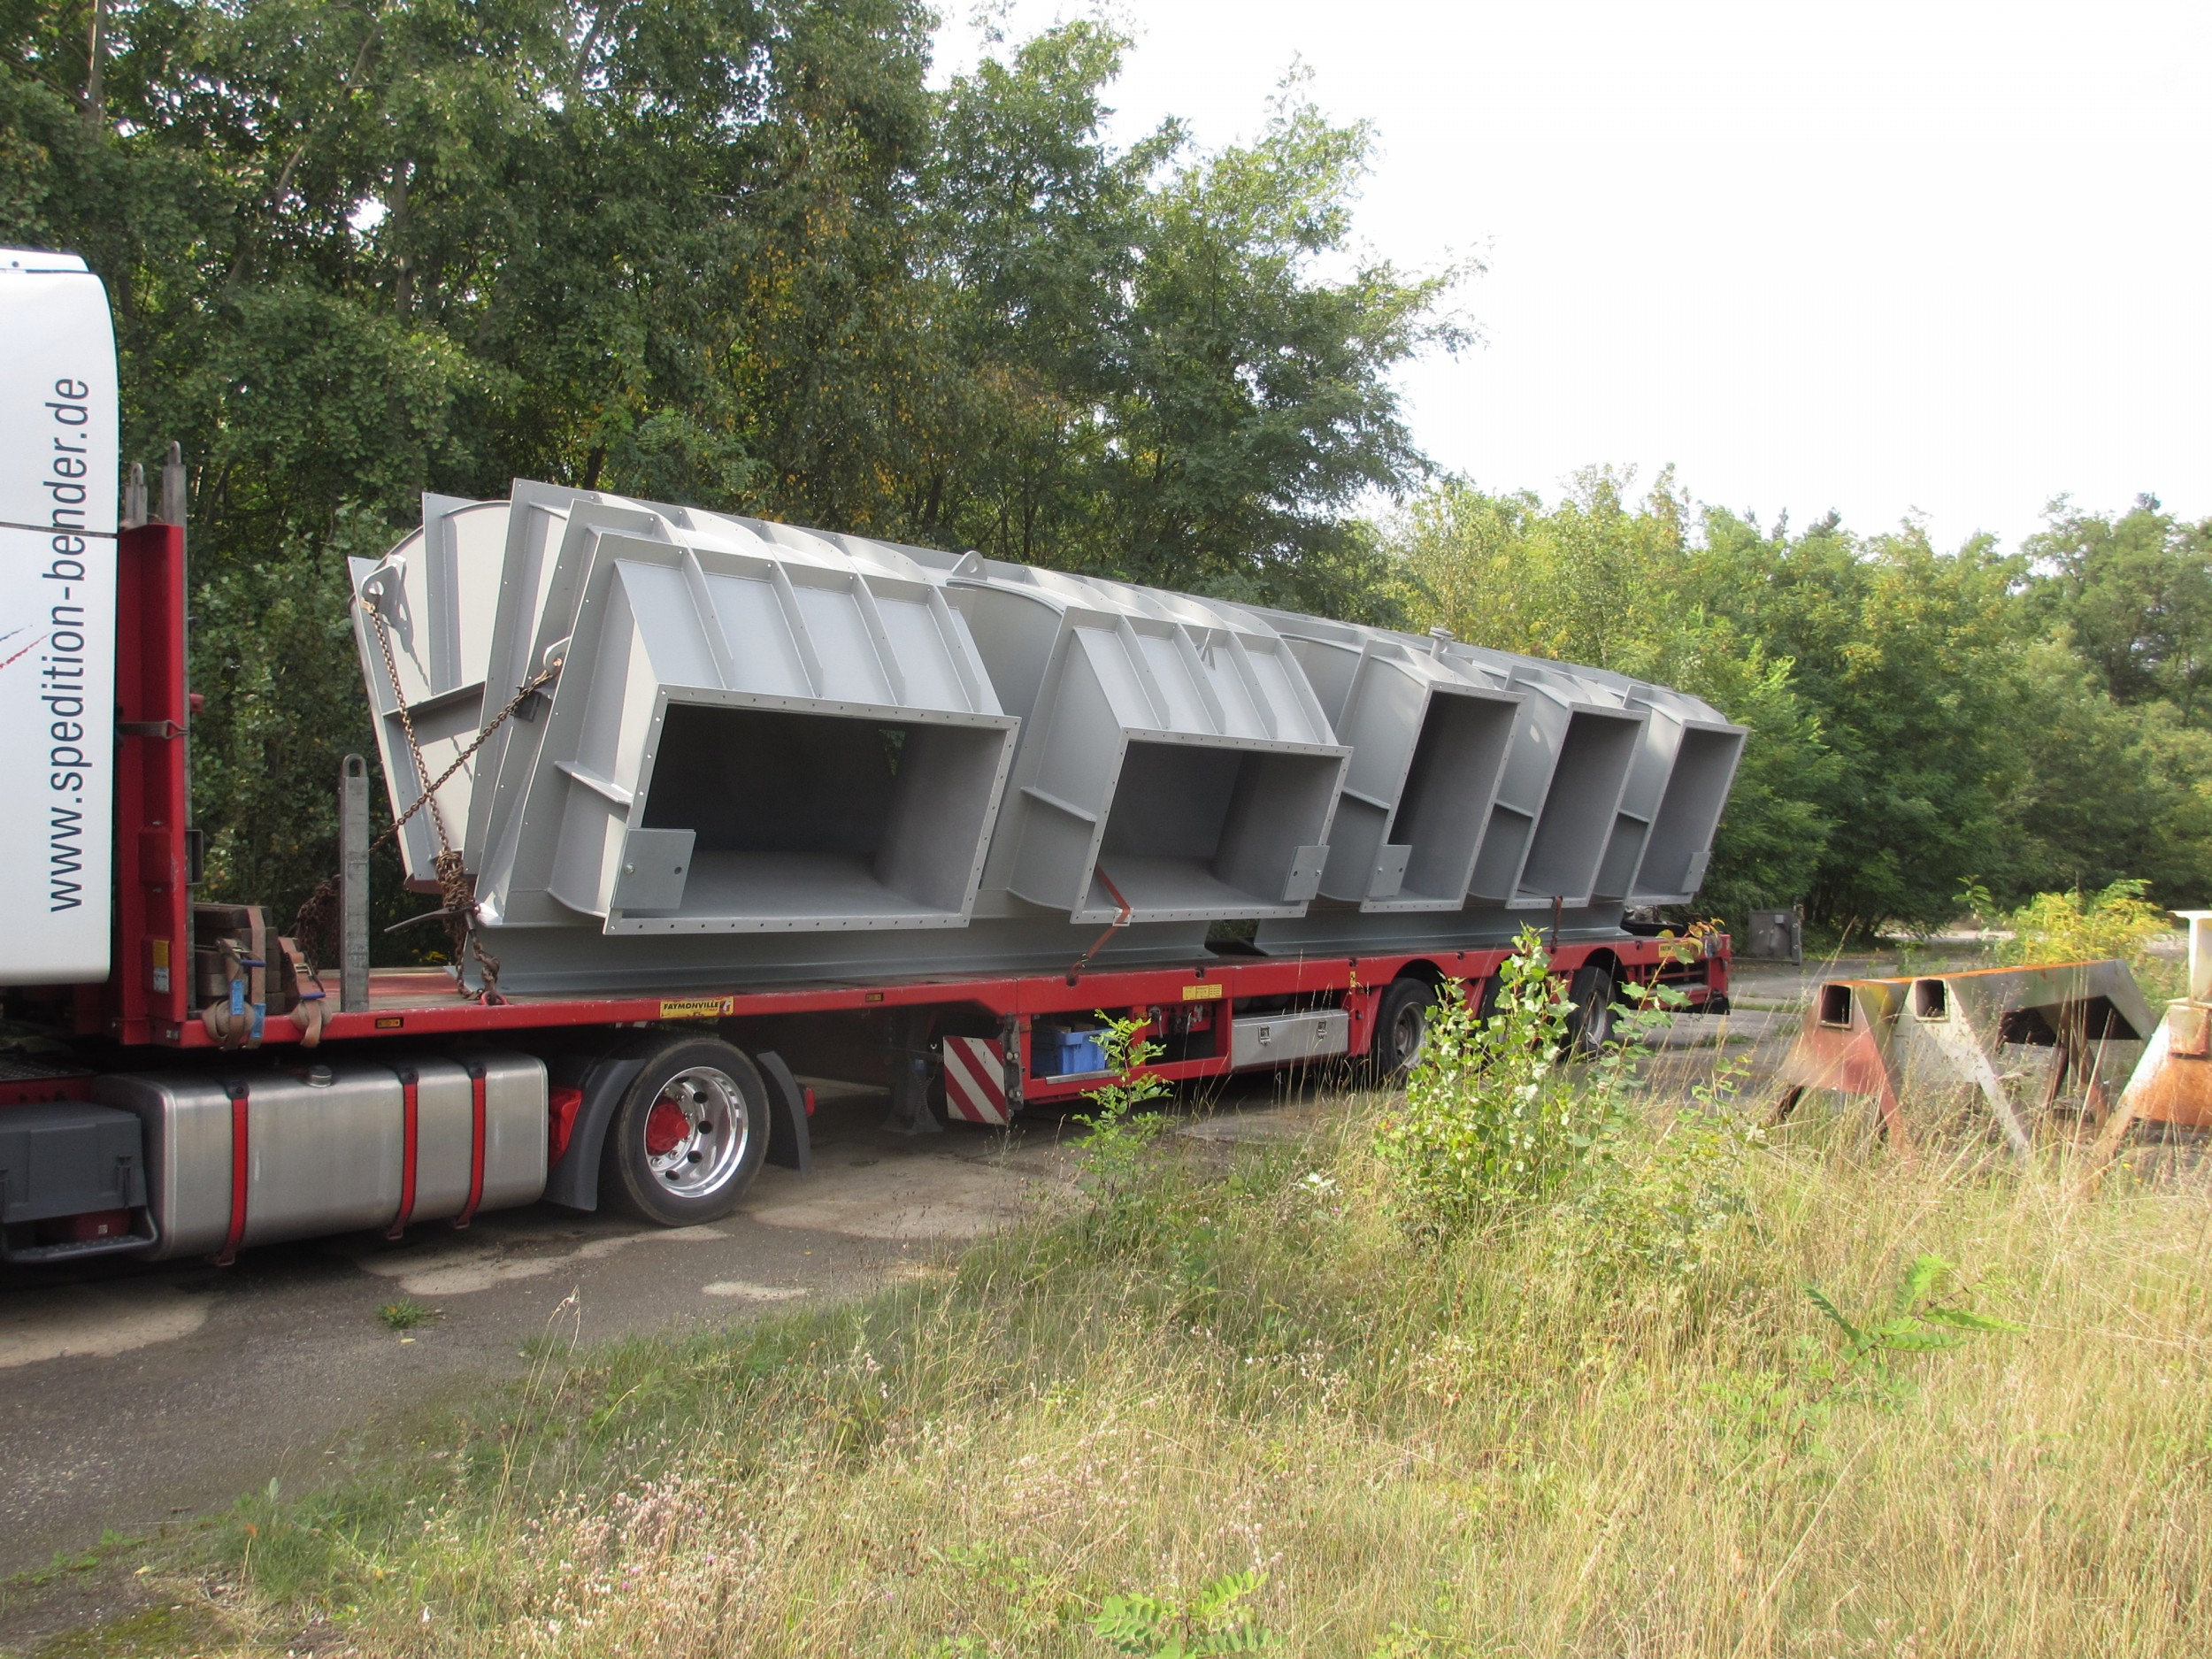 Sammelkanal - Fertig für Transport / Collecting duct - on transport